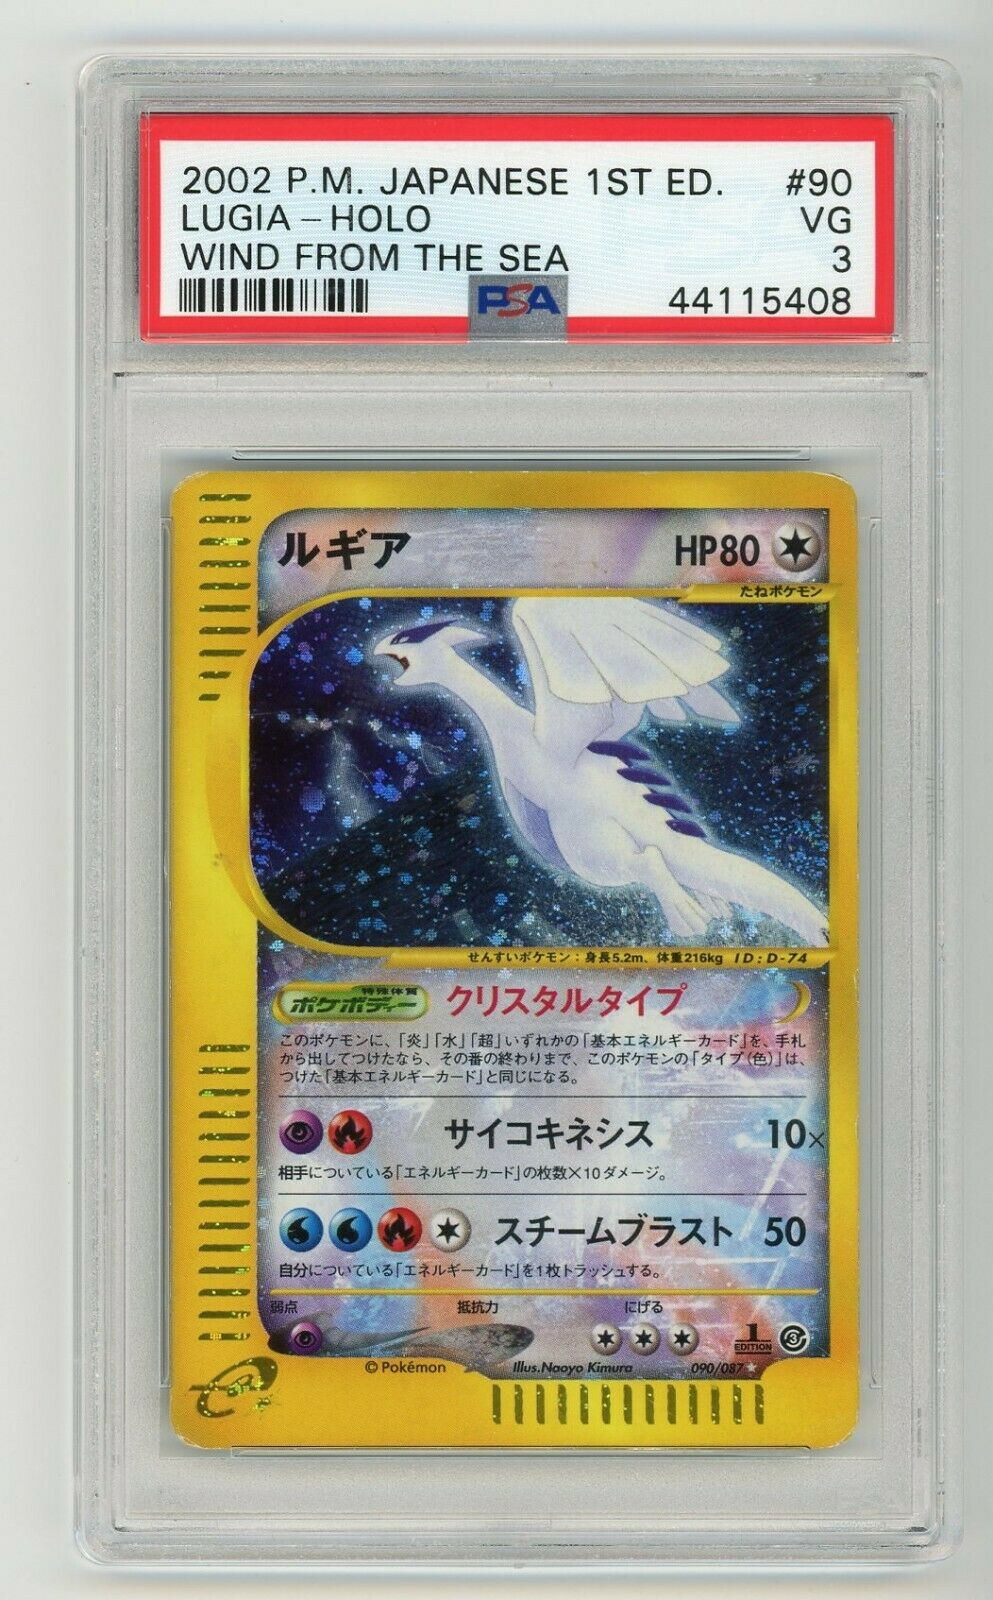 PSA 3 POKEMON JAPANESE CRYSTAL LUGIA 090 CARD 2002 1ST ED ESERIES AQUAPOLIS